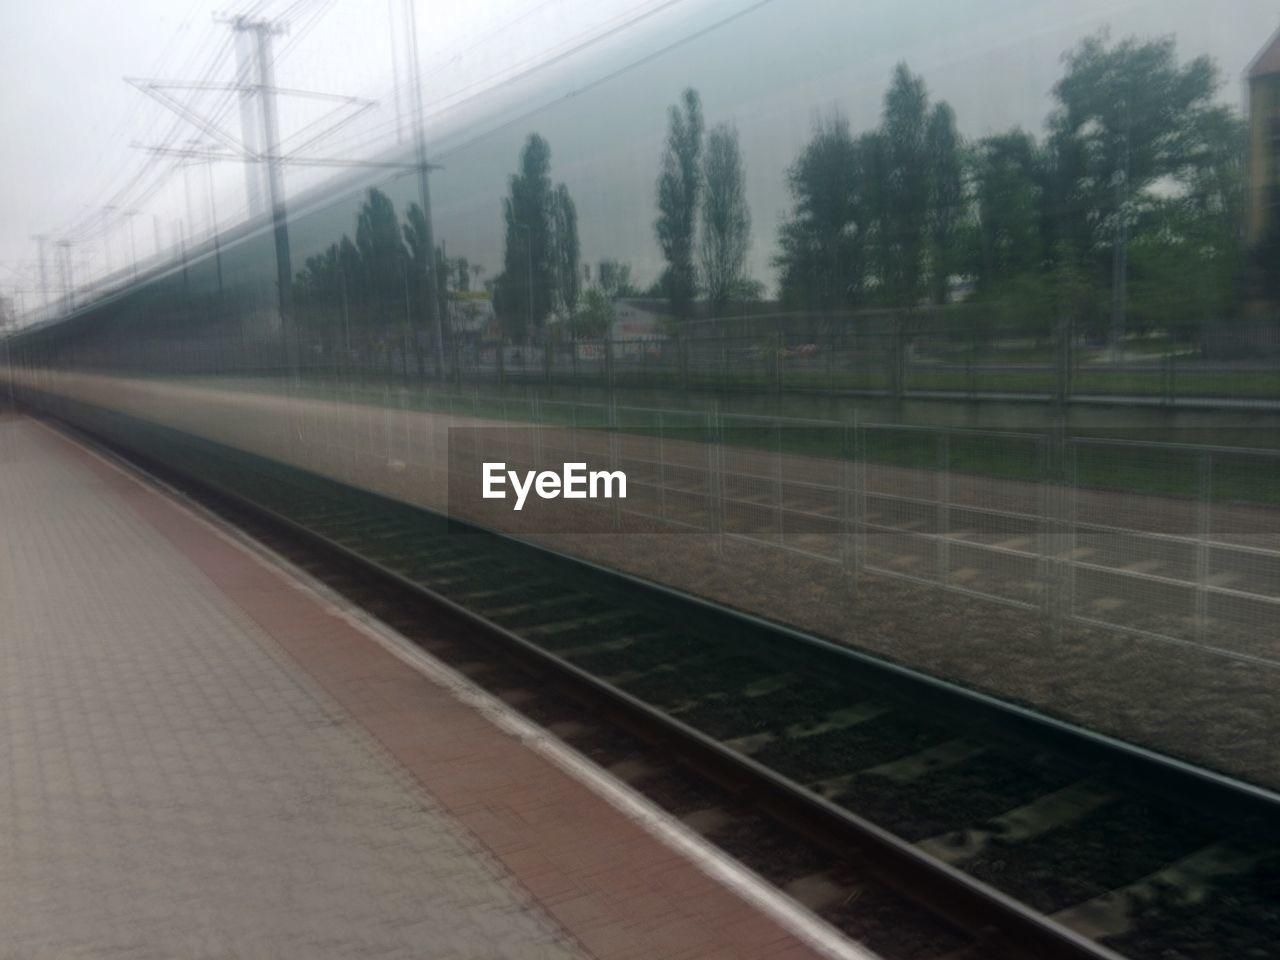 Speeding blurred train at railway station